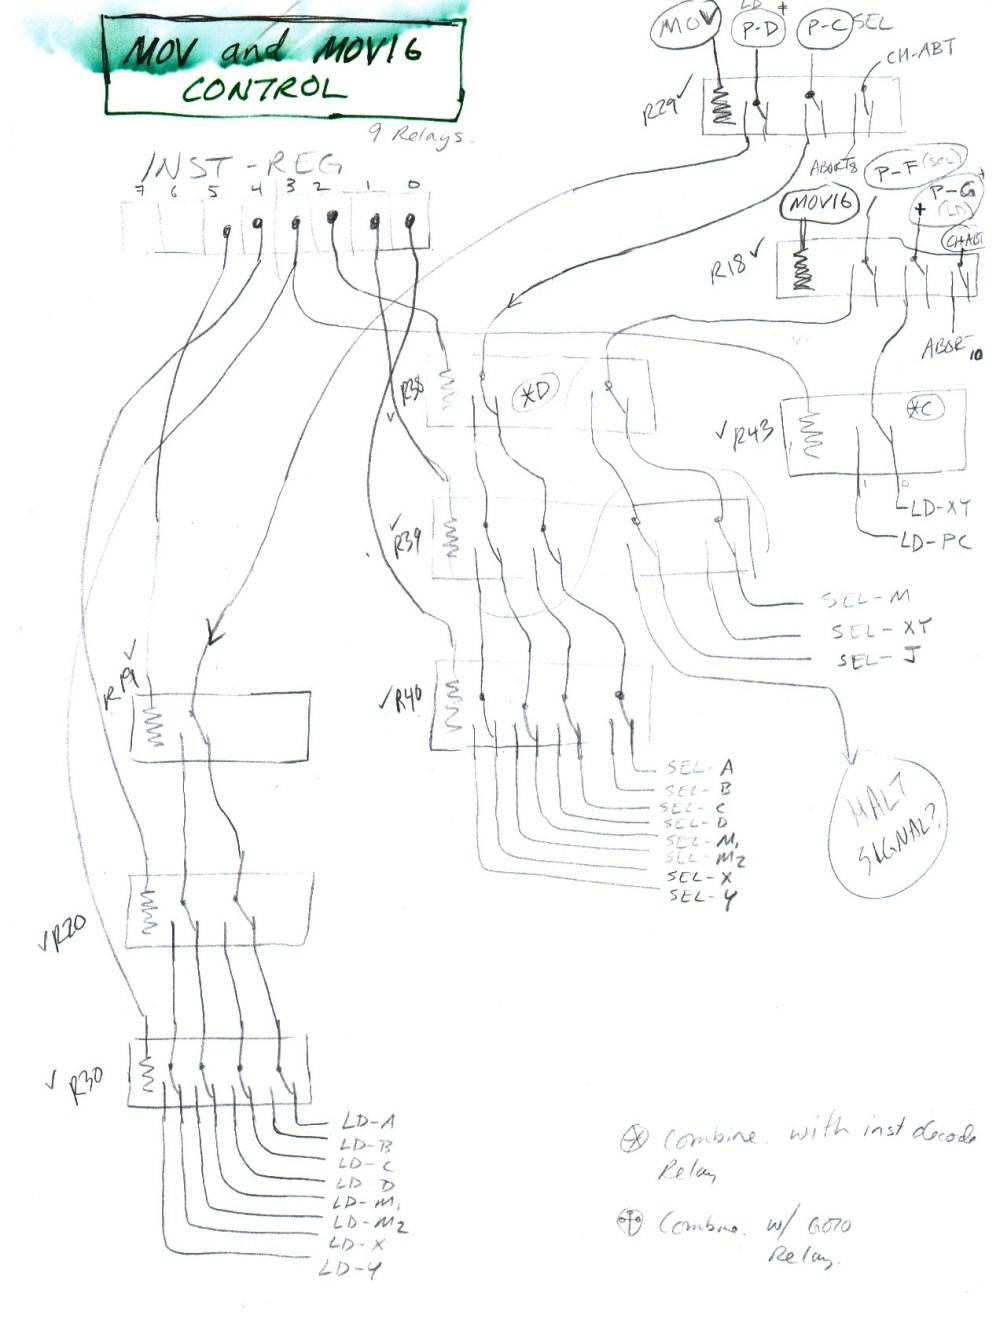 medium resolution of controlcircuit 3